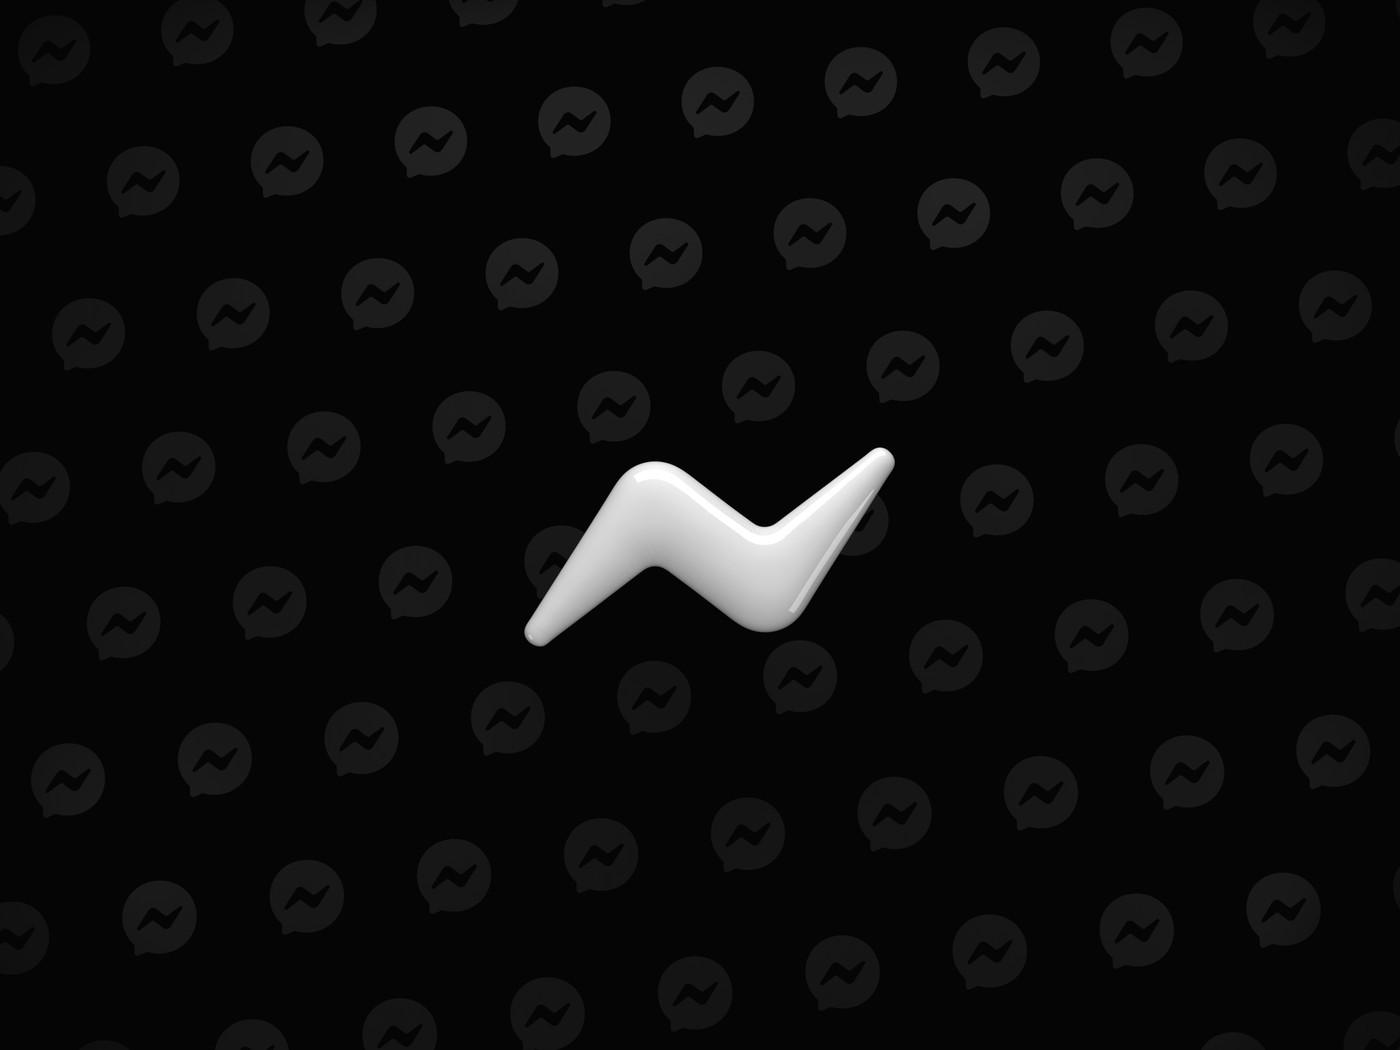 Facebook Messenger Gets Dark Mode The Verge